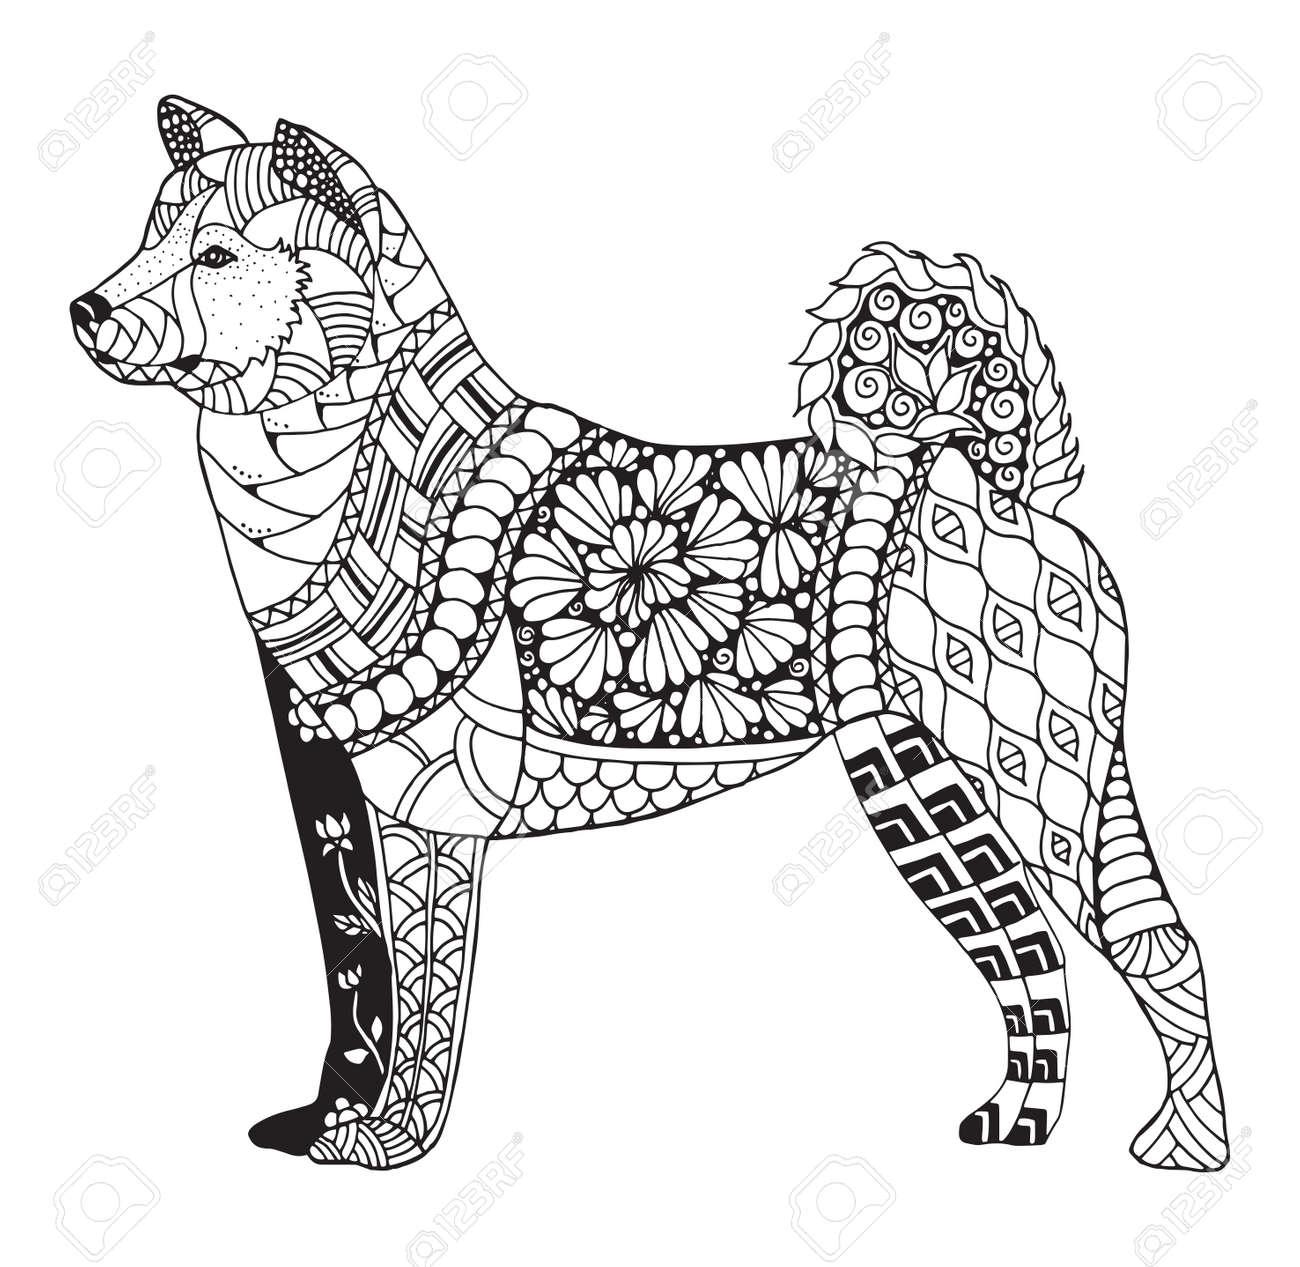 Akita dog zentangle stylized, vector, illustration, freehand pencil, hand drawn, pattern. Zen art. - 80629079